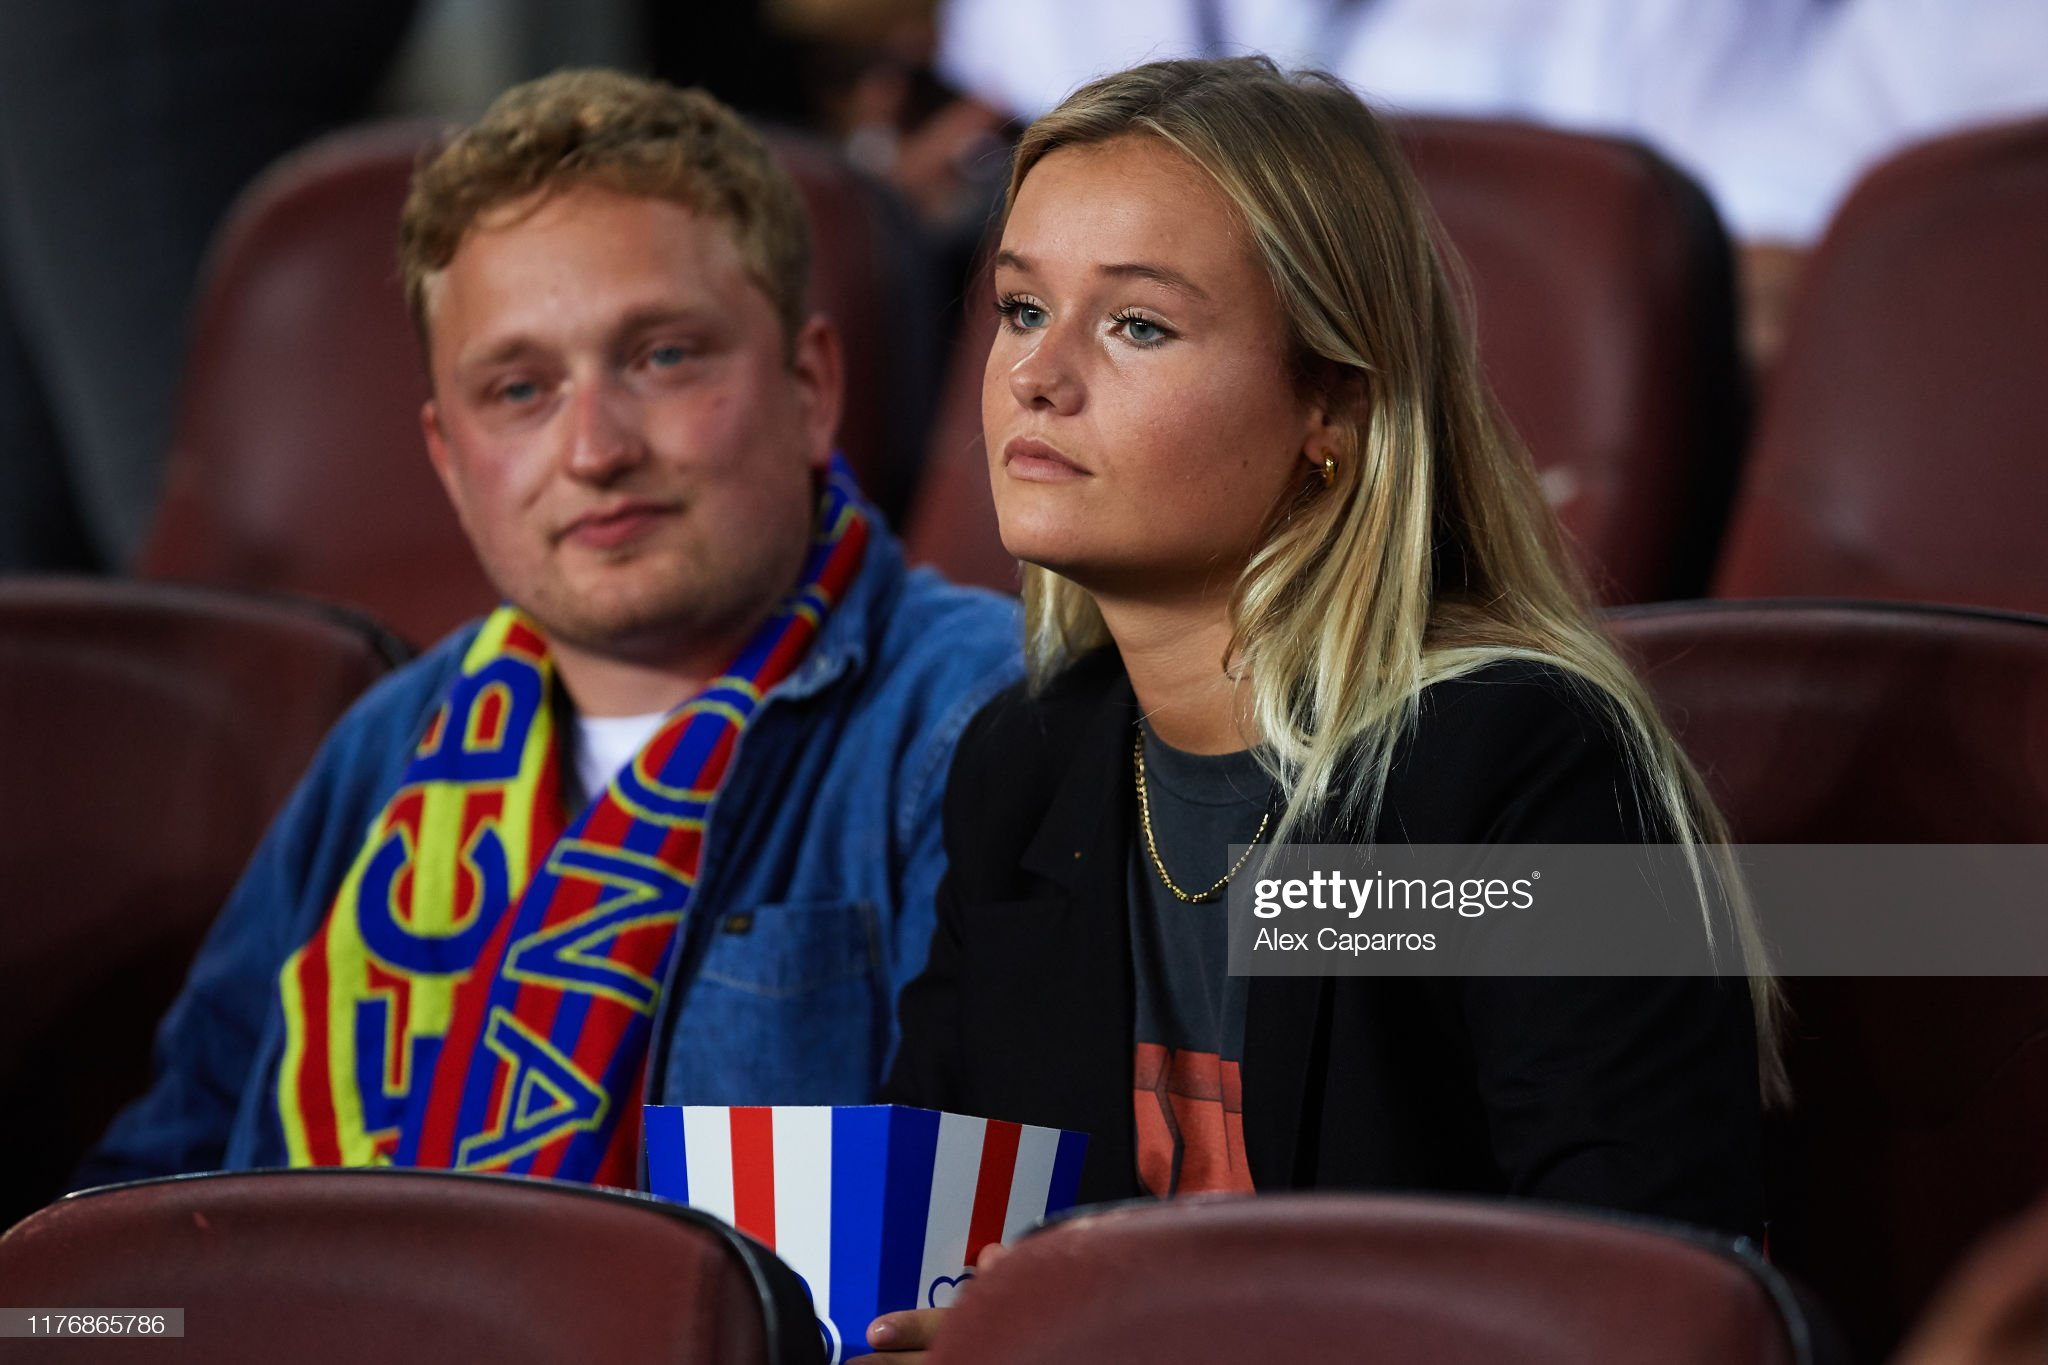 صور مباراة : برشلونة - فياريال 2-1 ( 24-09-2019 )  Mikky-kiemeney-girlfriend-of-frenkie-de-jong-of-fc-barcelona-looks-on-picture-id1176865786?s=2048x2048